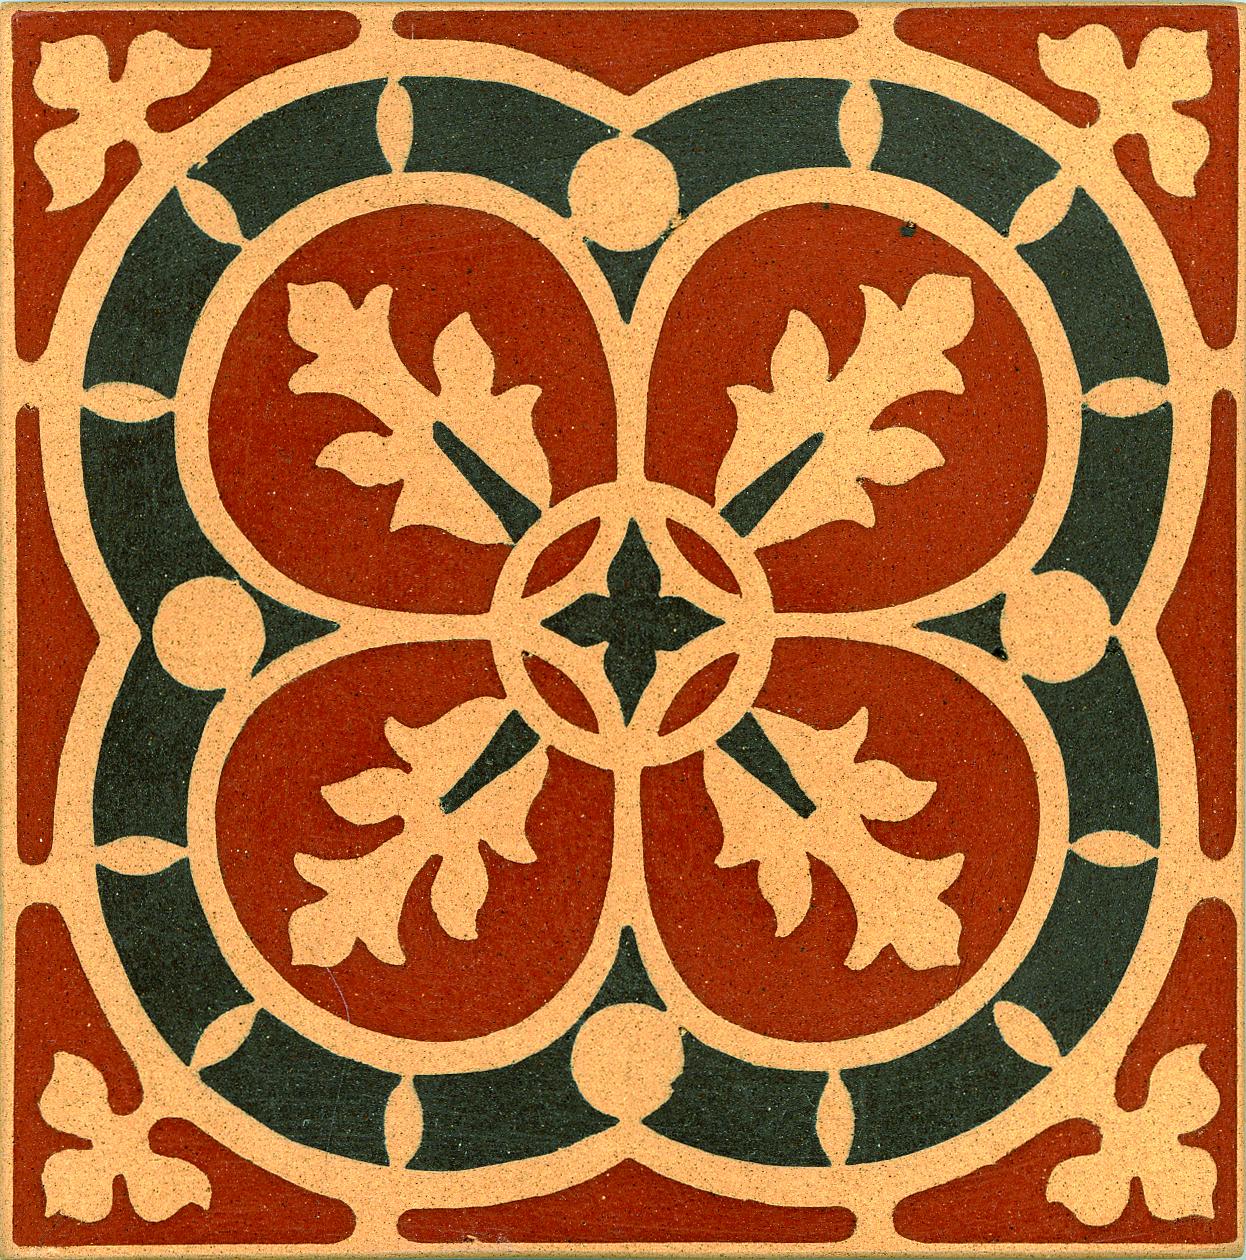 Encaustic Tile 108mmx108mm 4041.jpg